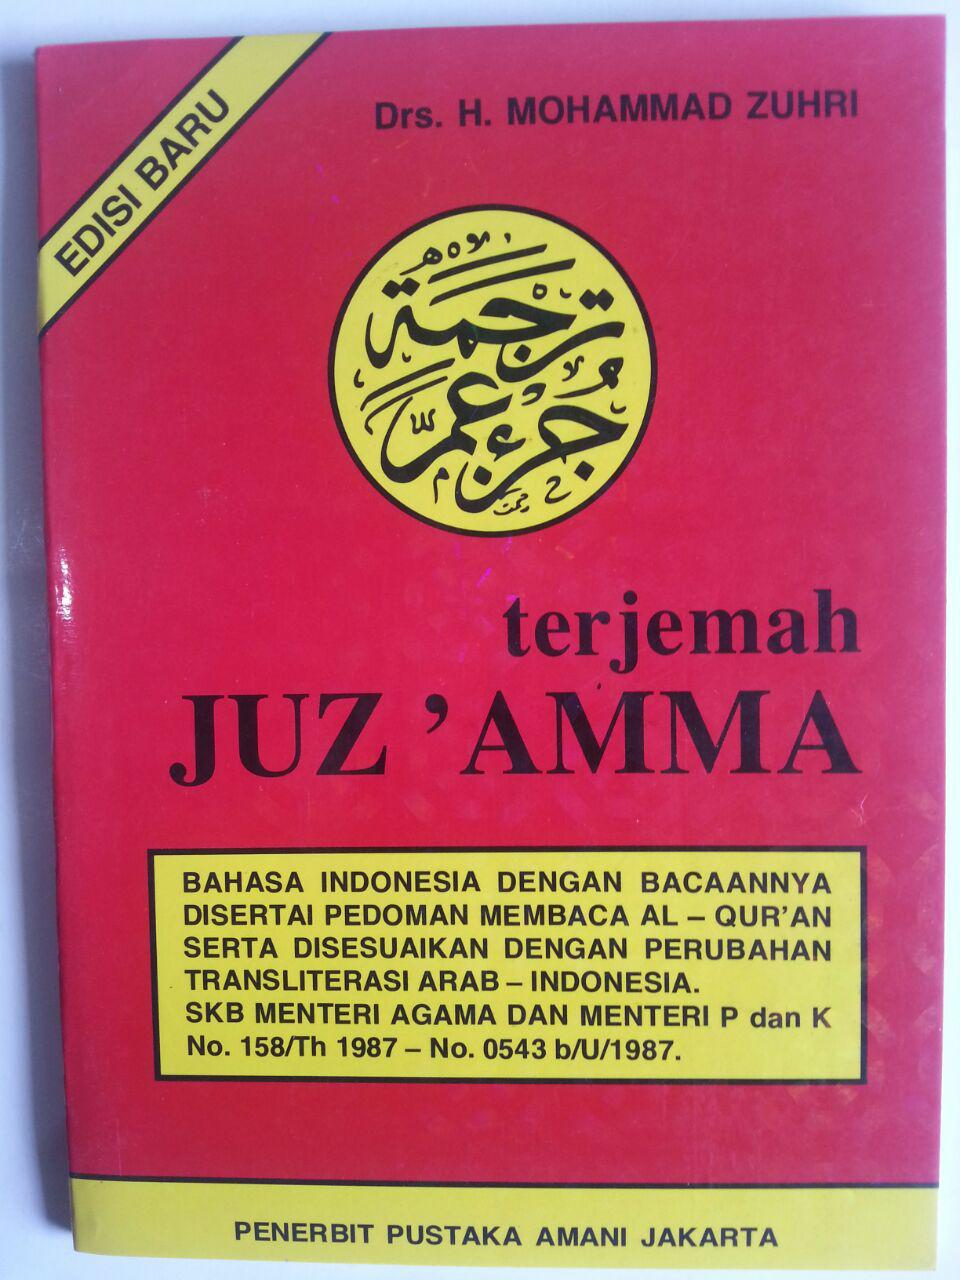 Buku Terjemah Juz Amma Pedoman Baca Quran Transliterasi cover